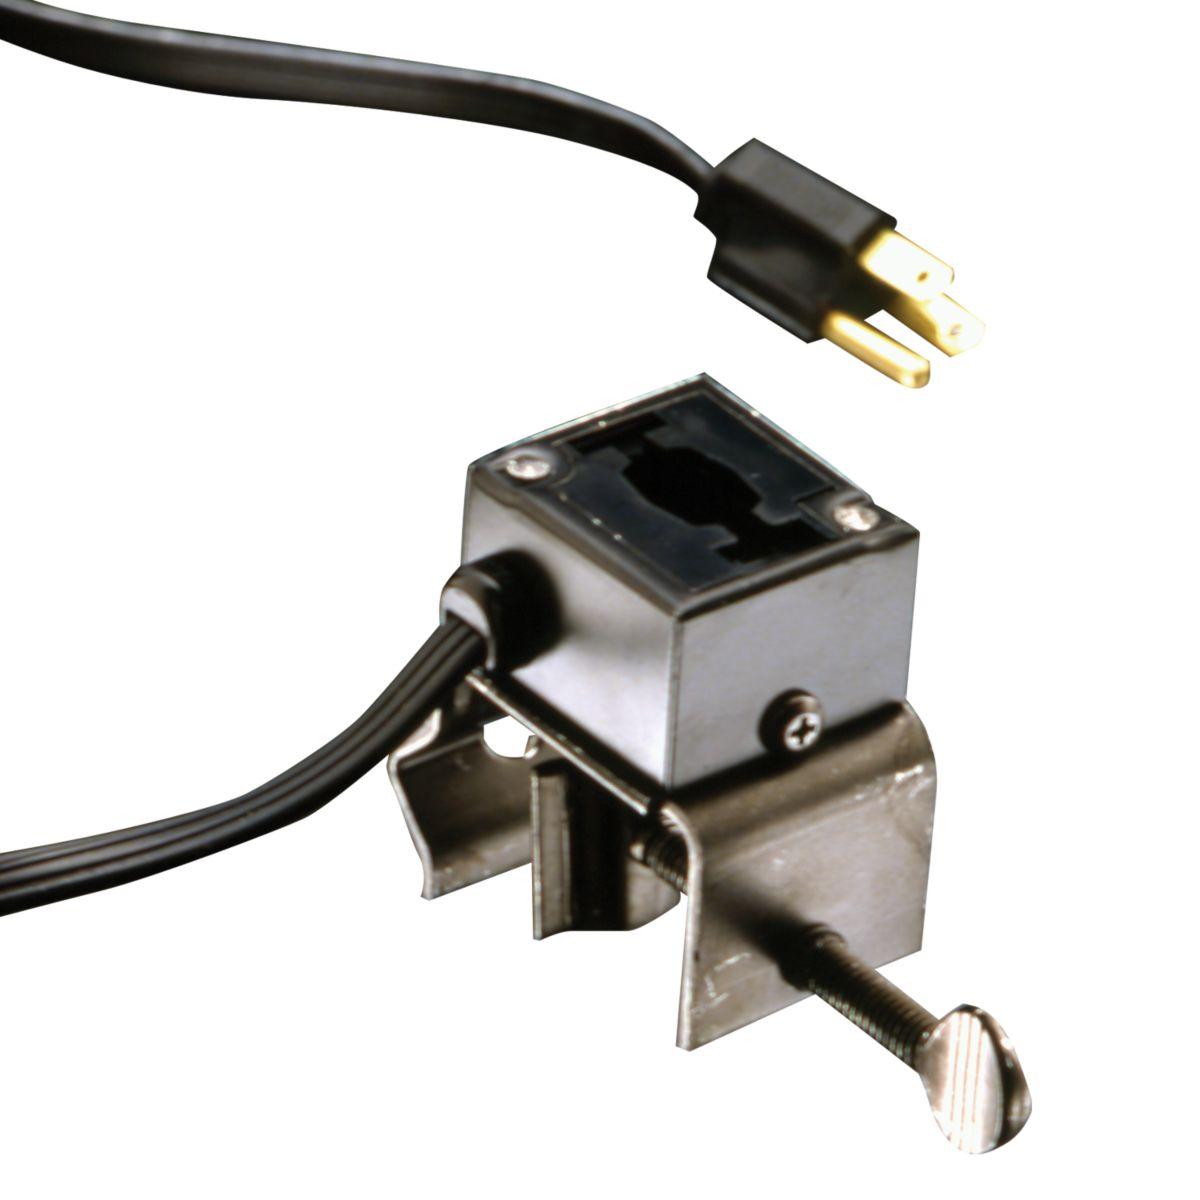 L972 C Clamp Adapter